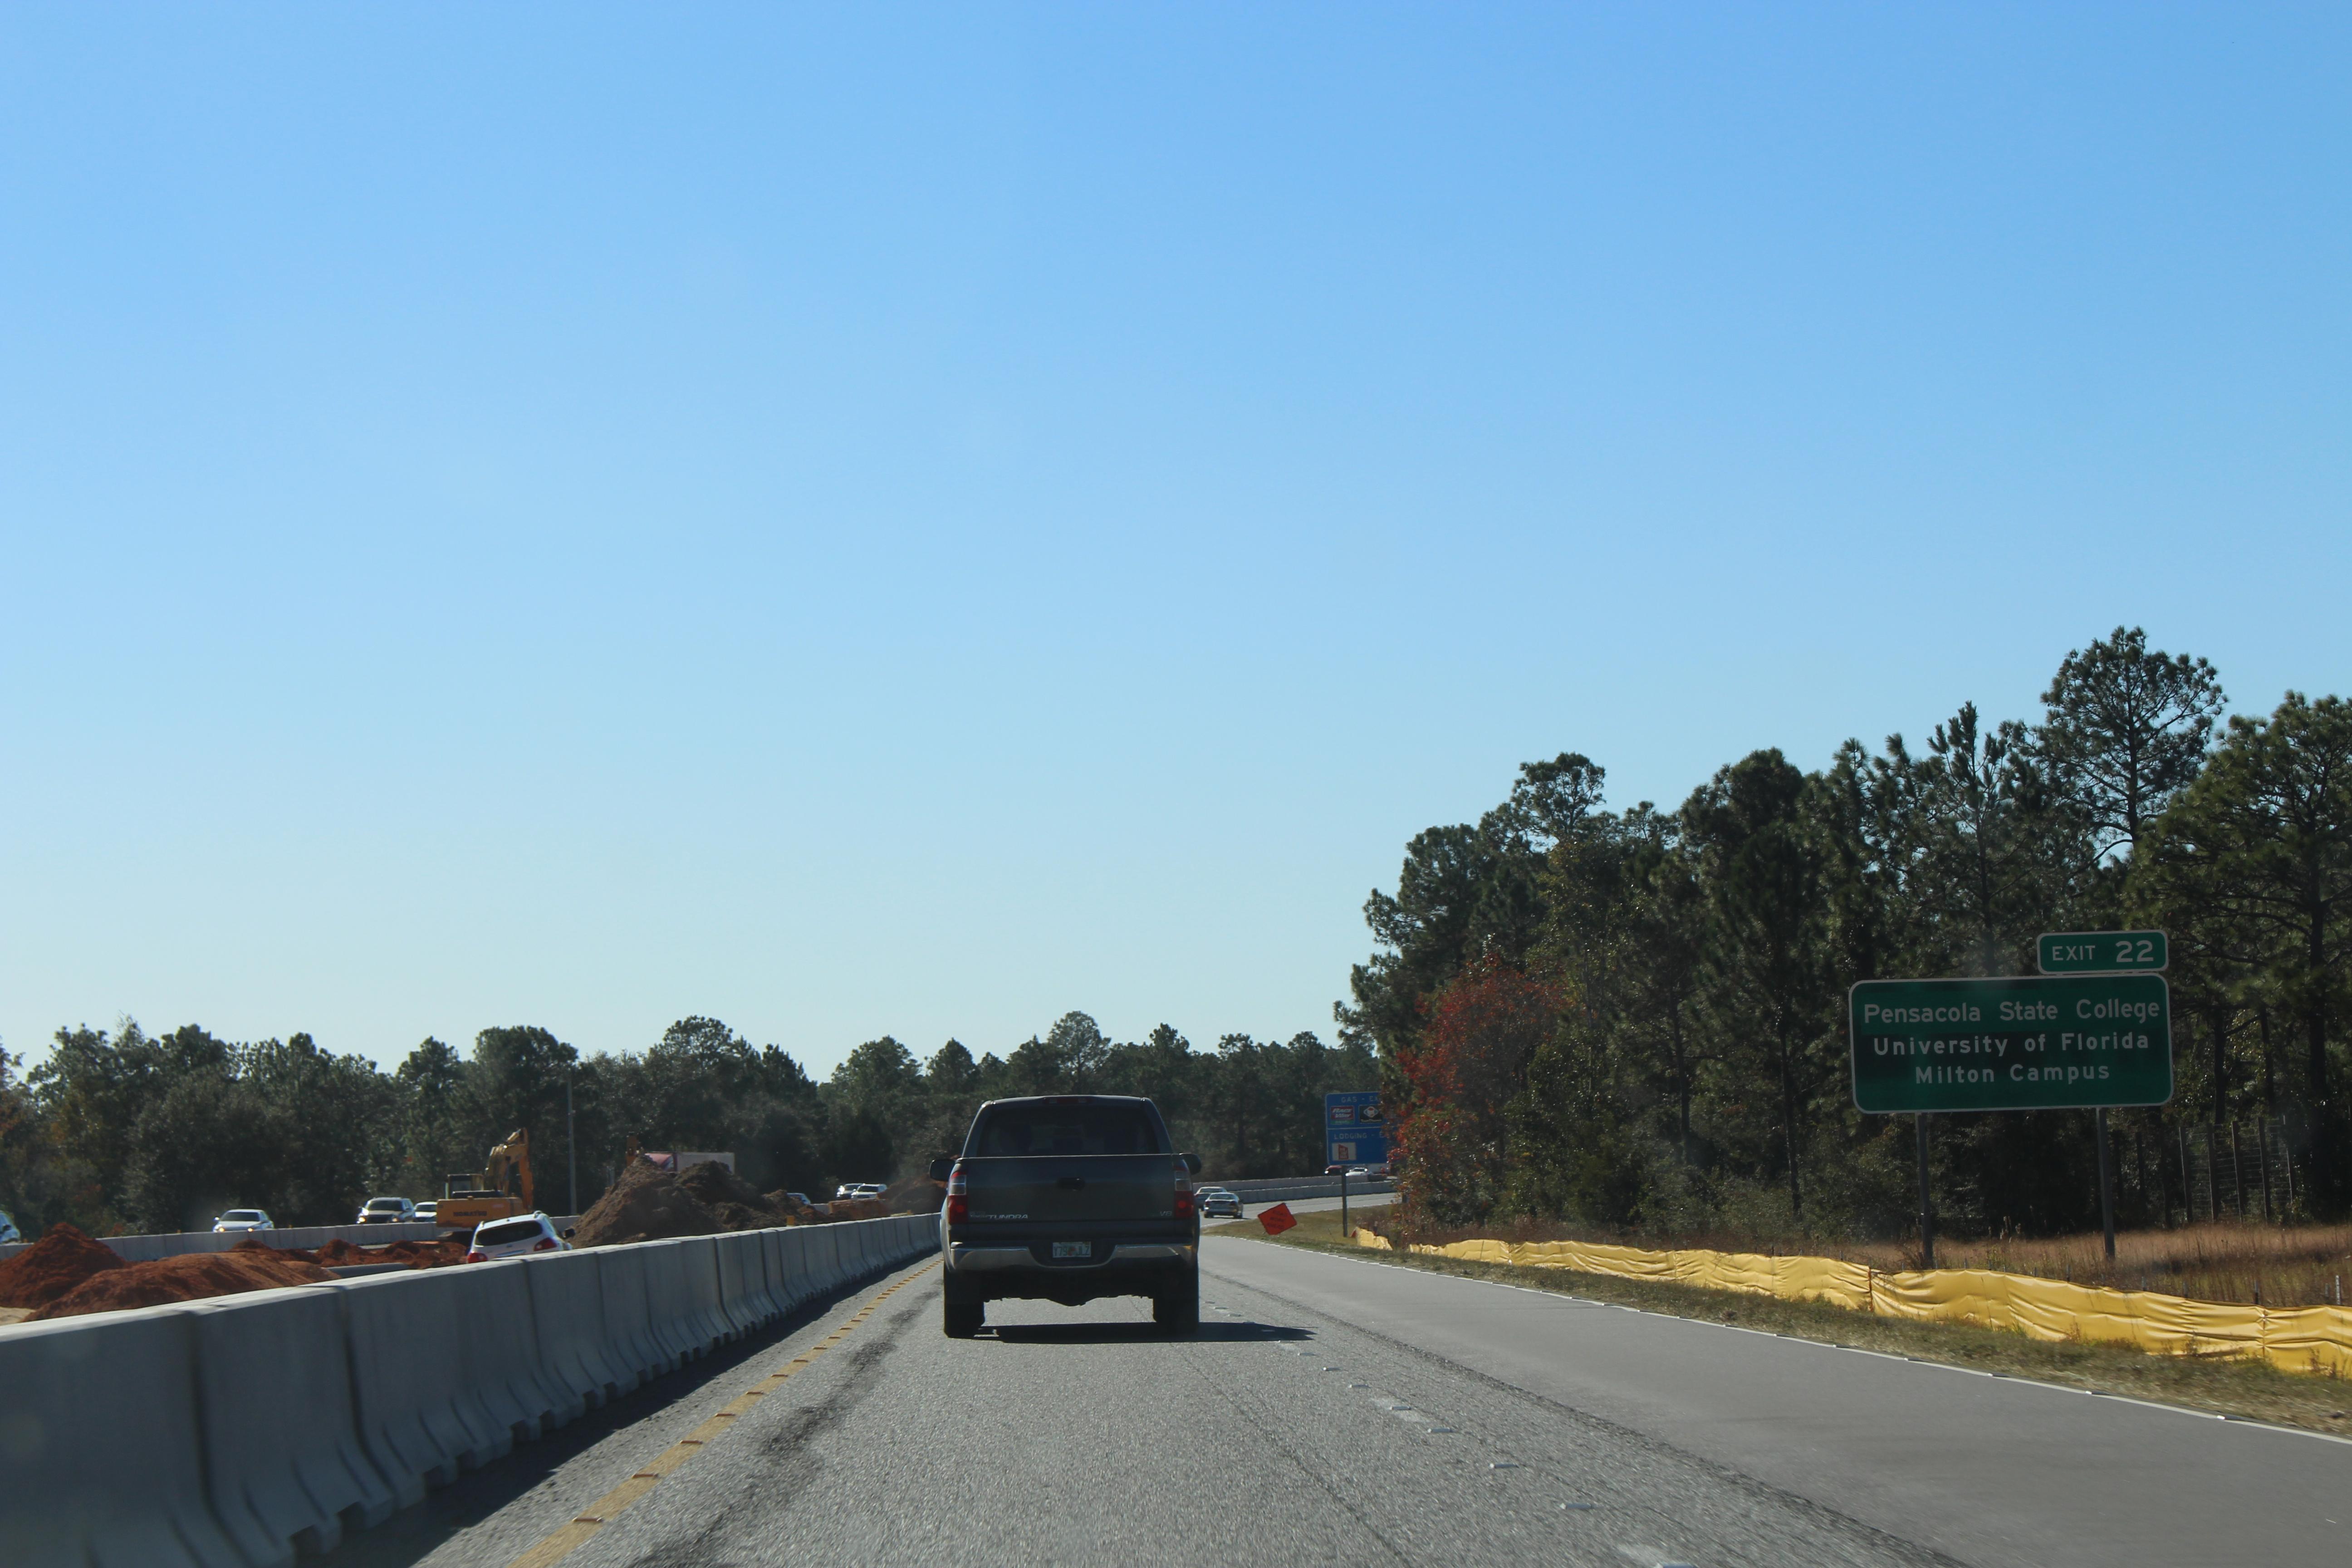 File:Florida I10wb Exit 22 Pensacola State College sign jpg